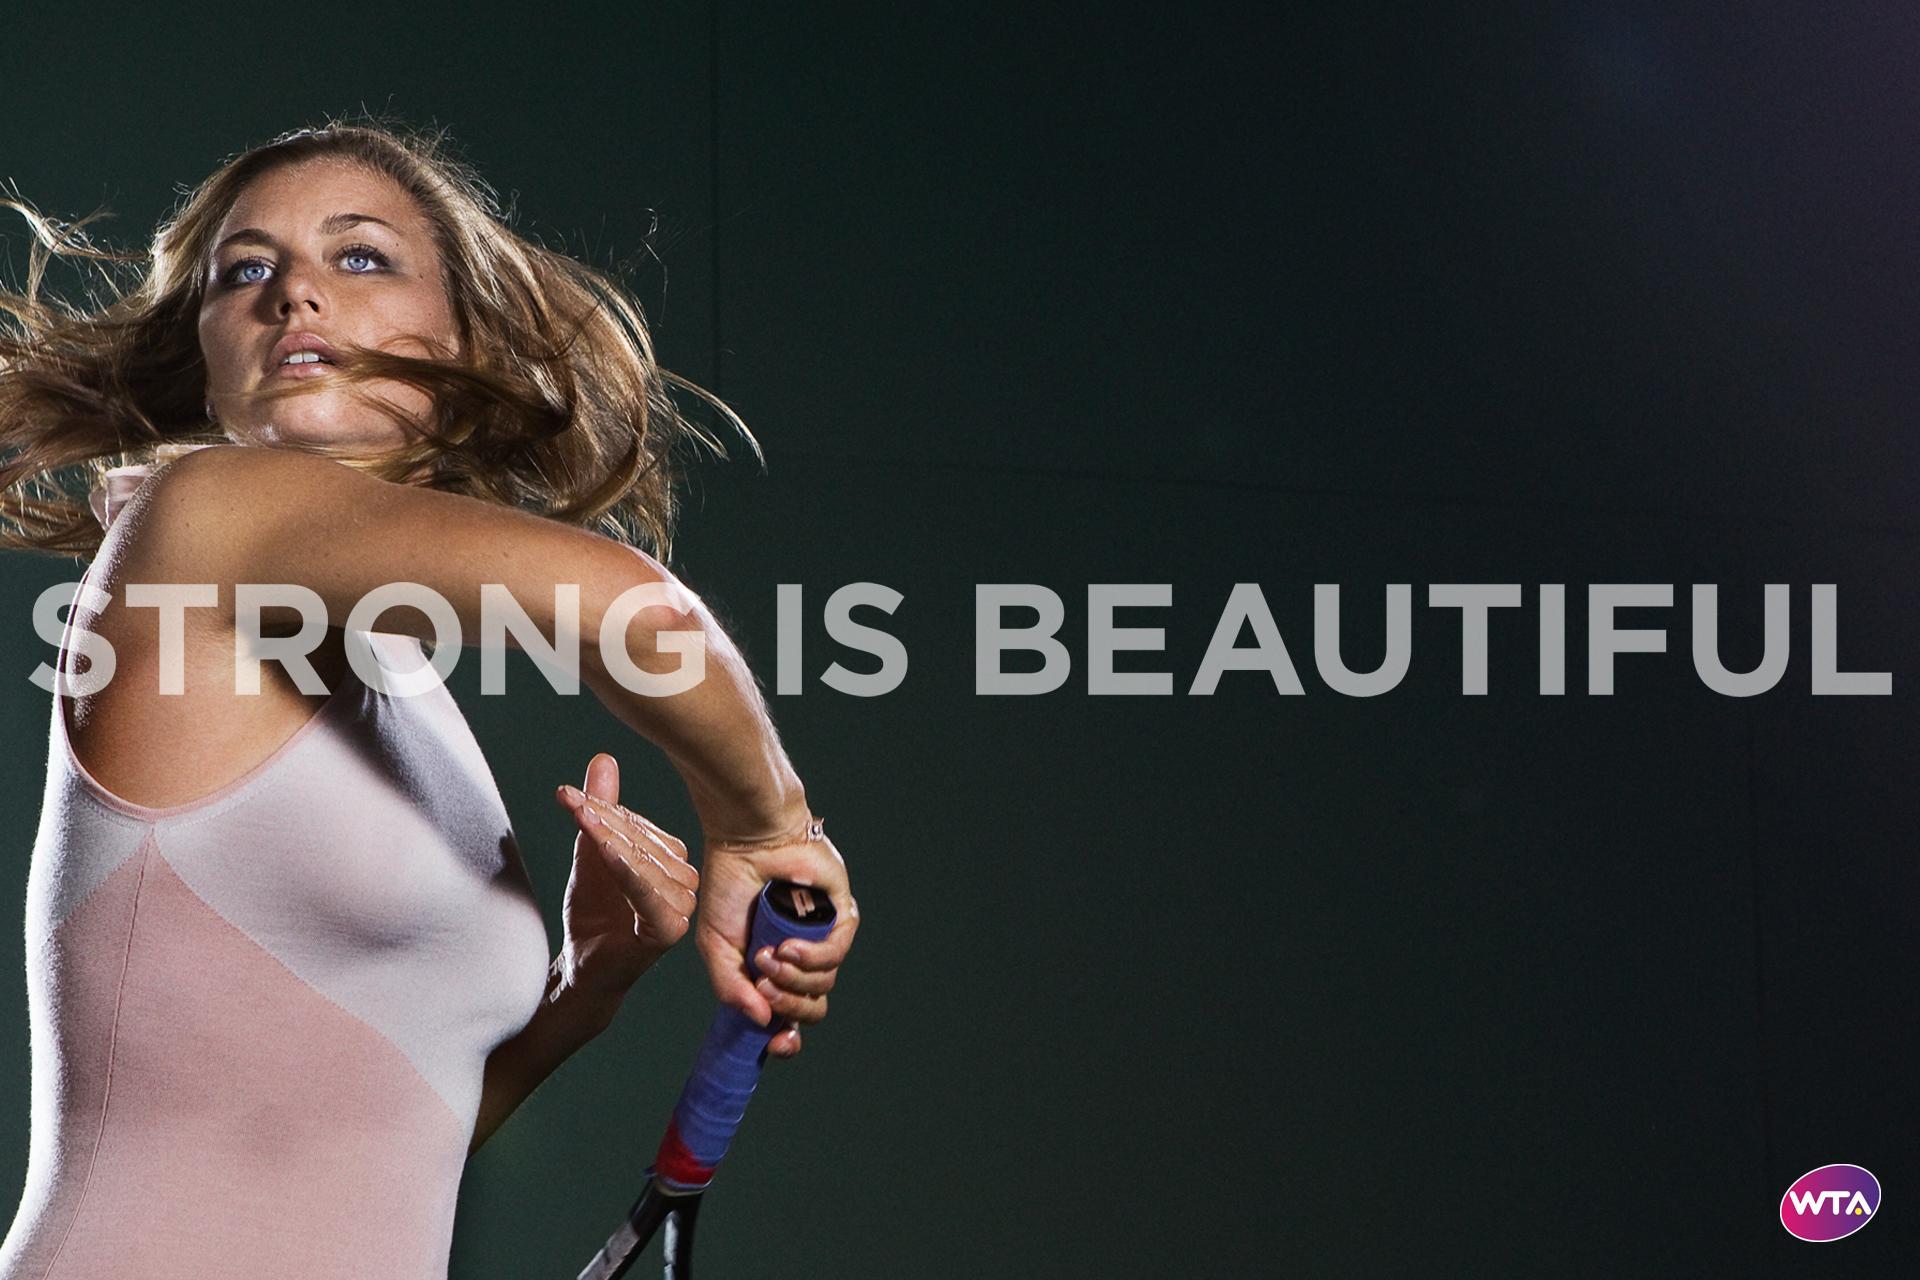 WTA:  du tennis féminin à TVA Sports jusqu'en 2019!